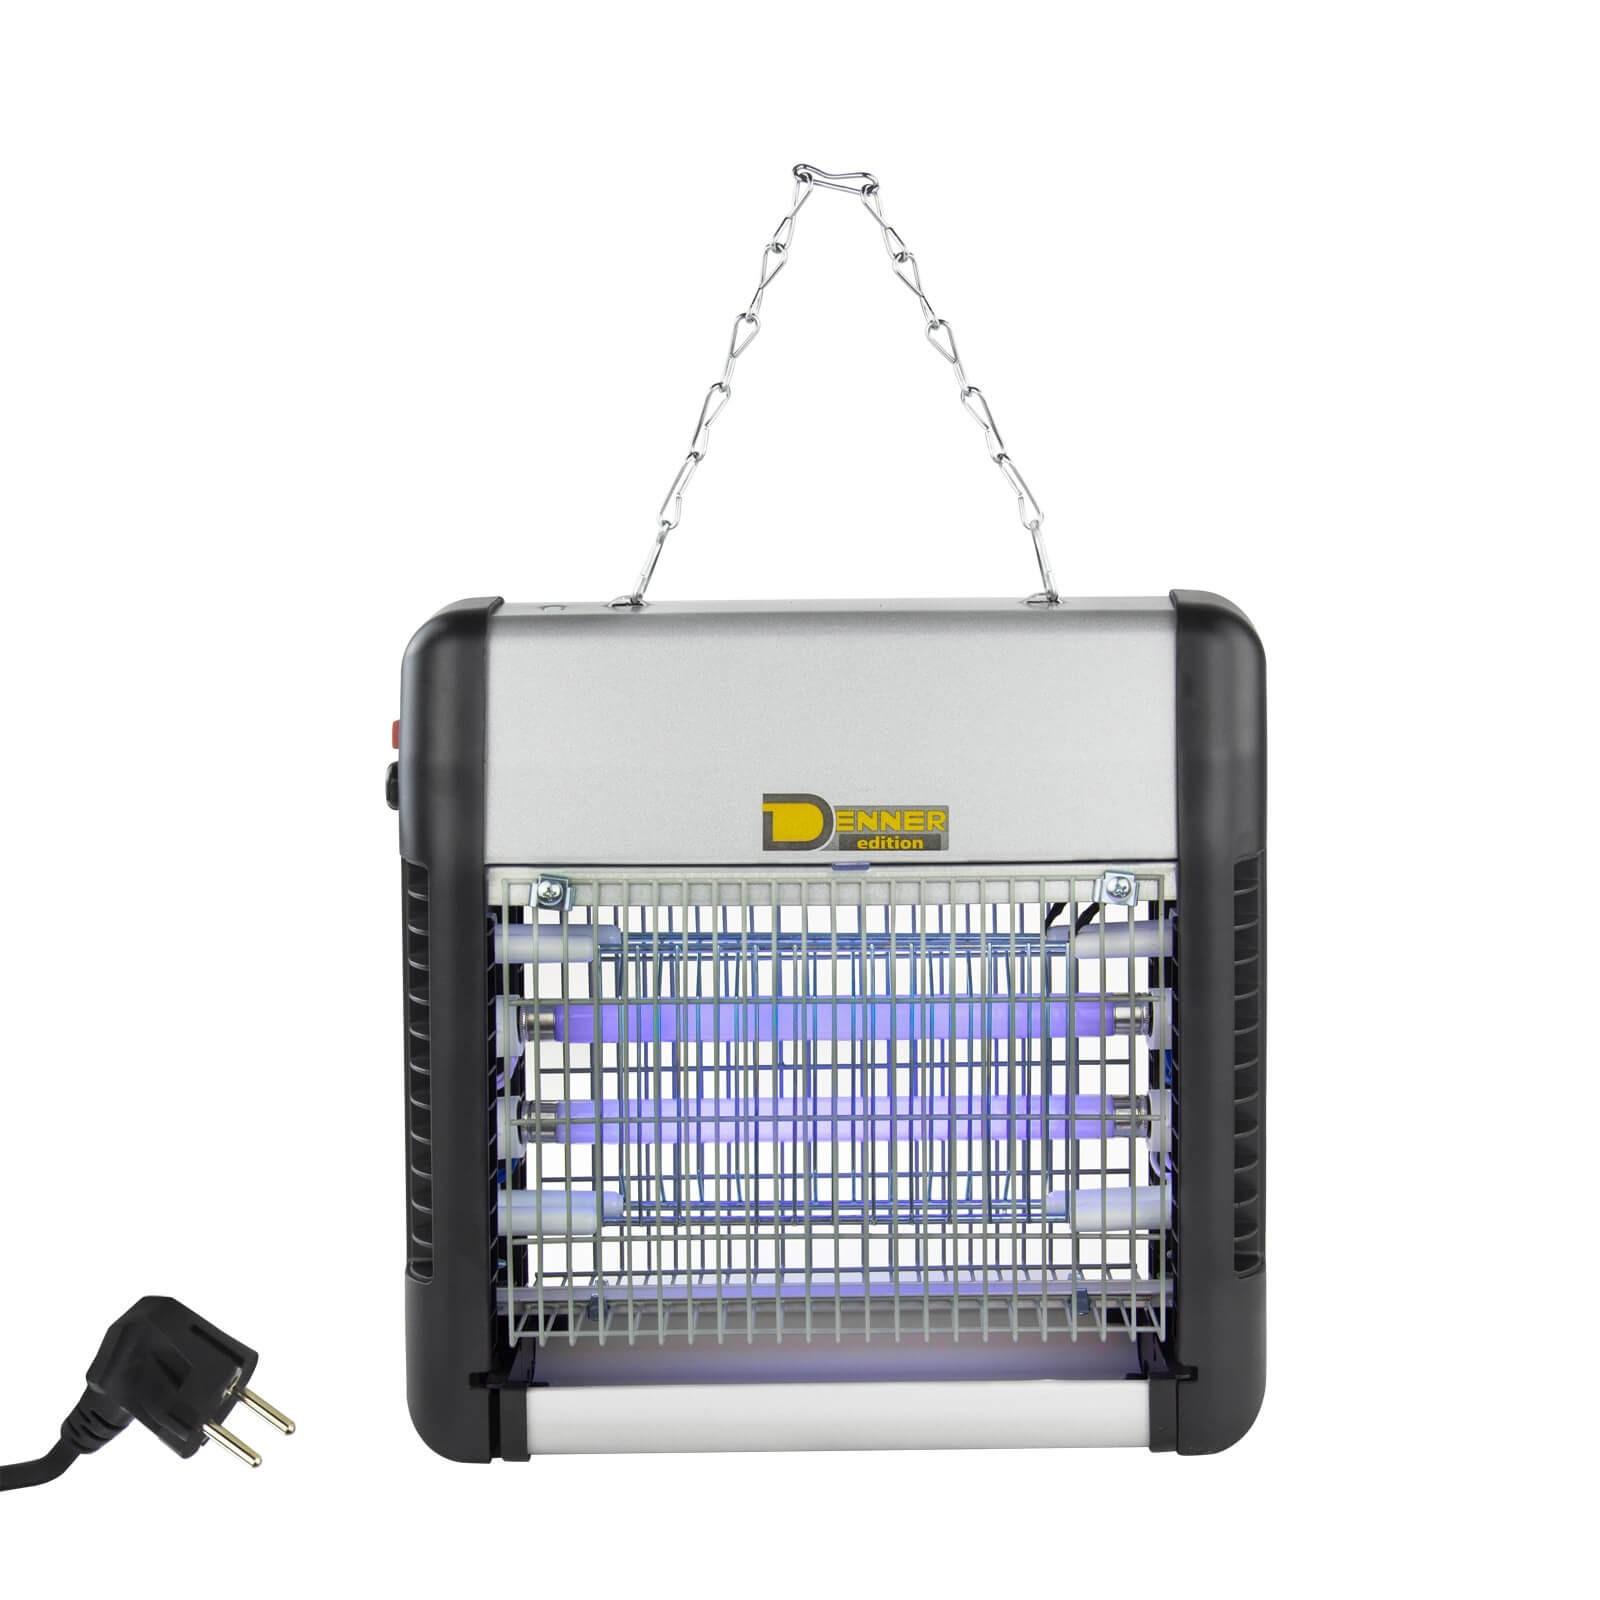 Denner-Edition Elektro Insektenvernichter / Insektenlampe / Insektenfalle 12 Watt UV 94250